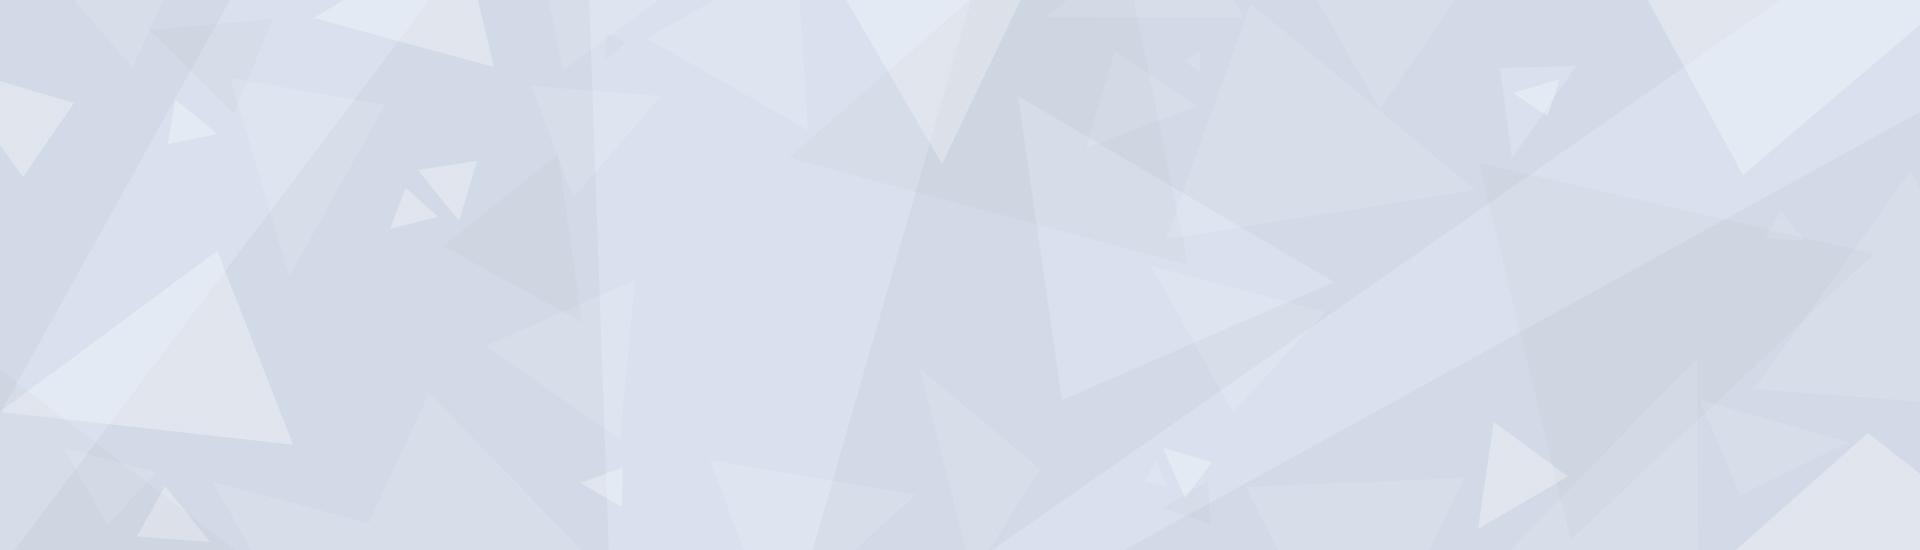 ZER0 - VSLeague Online eSport